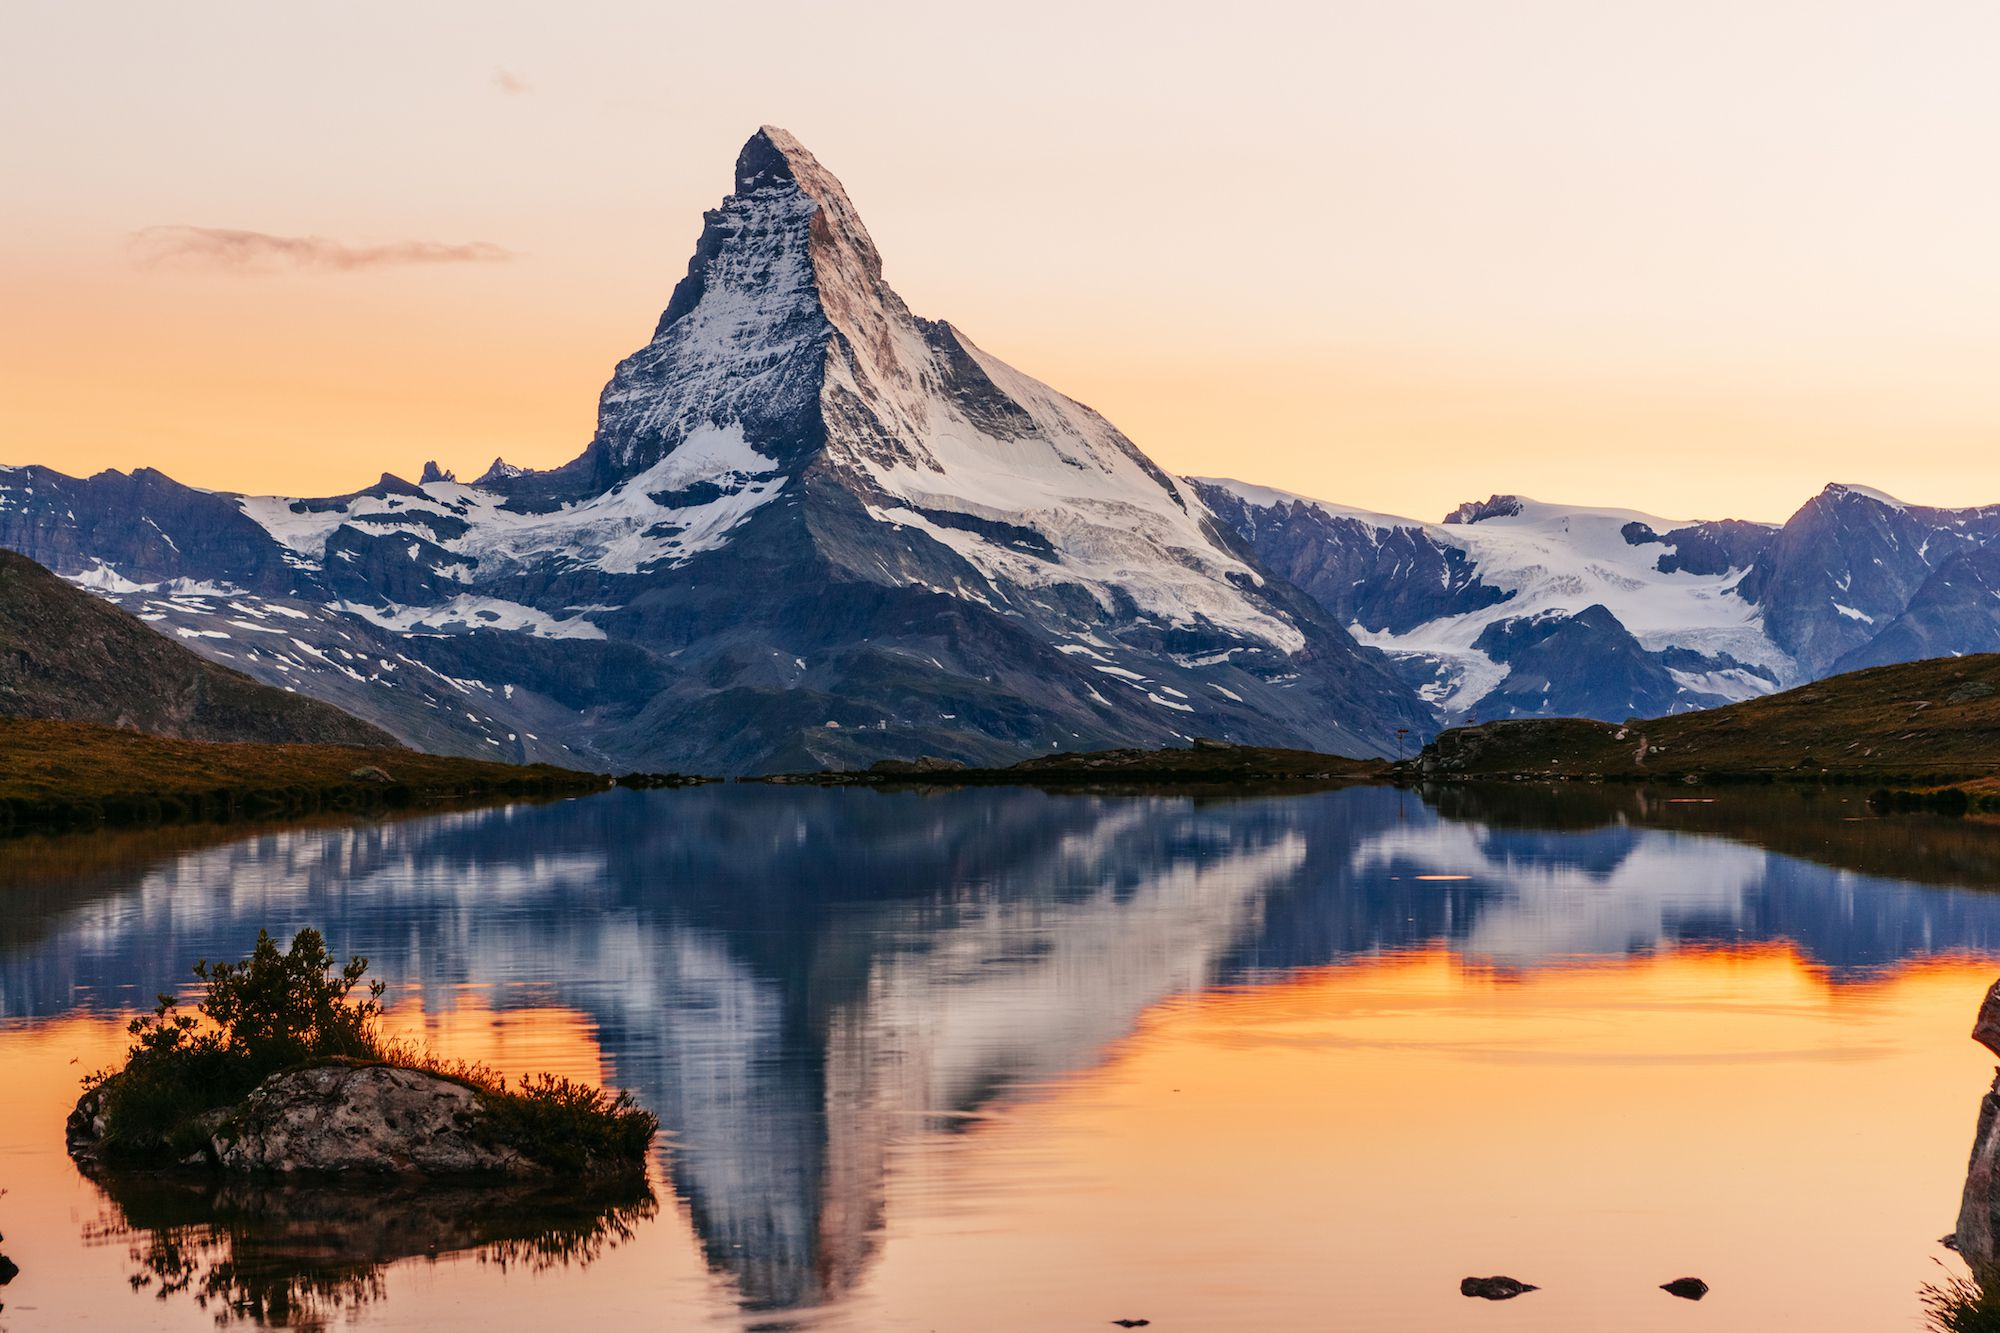 The Matterhorn Is Switzerlands Famous Mountain